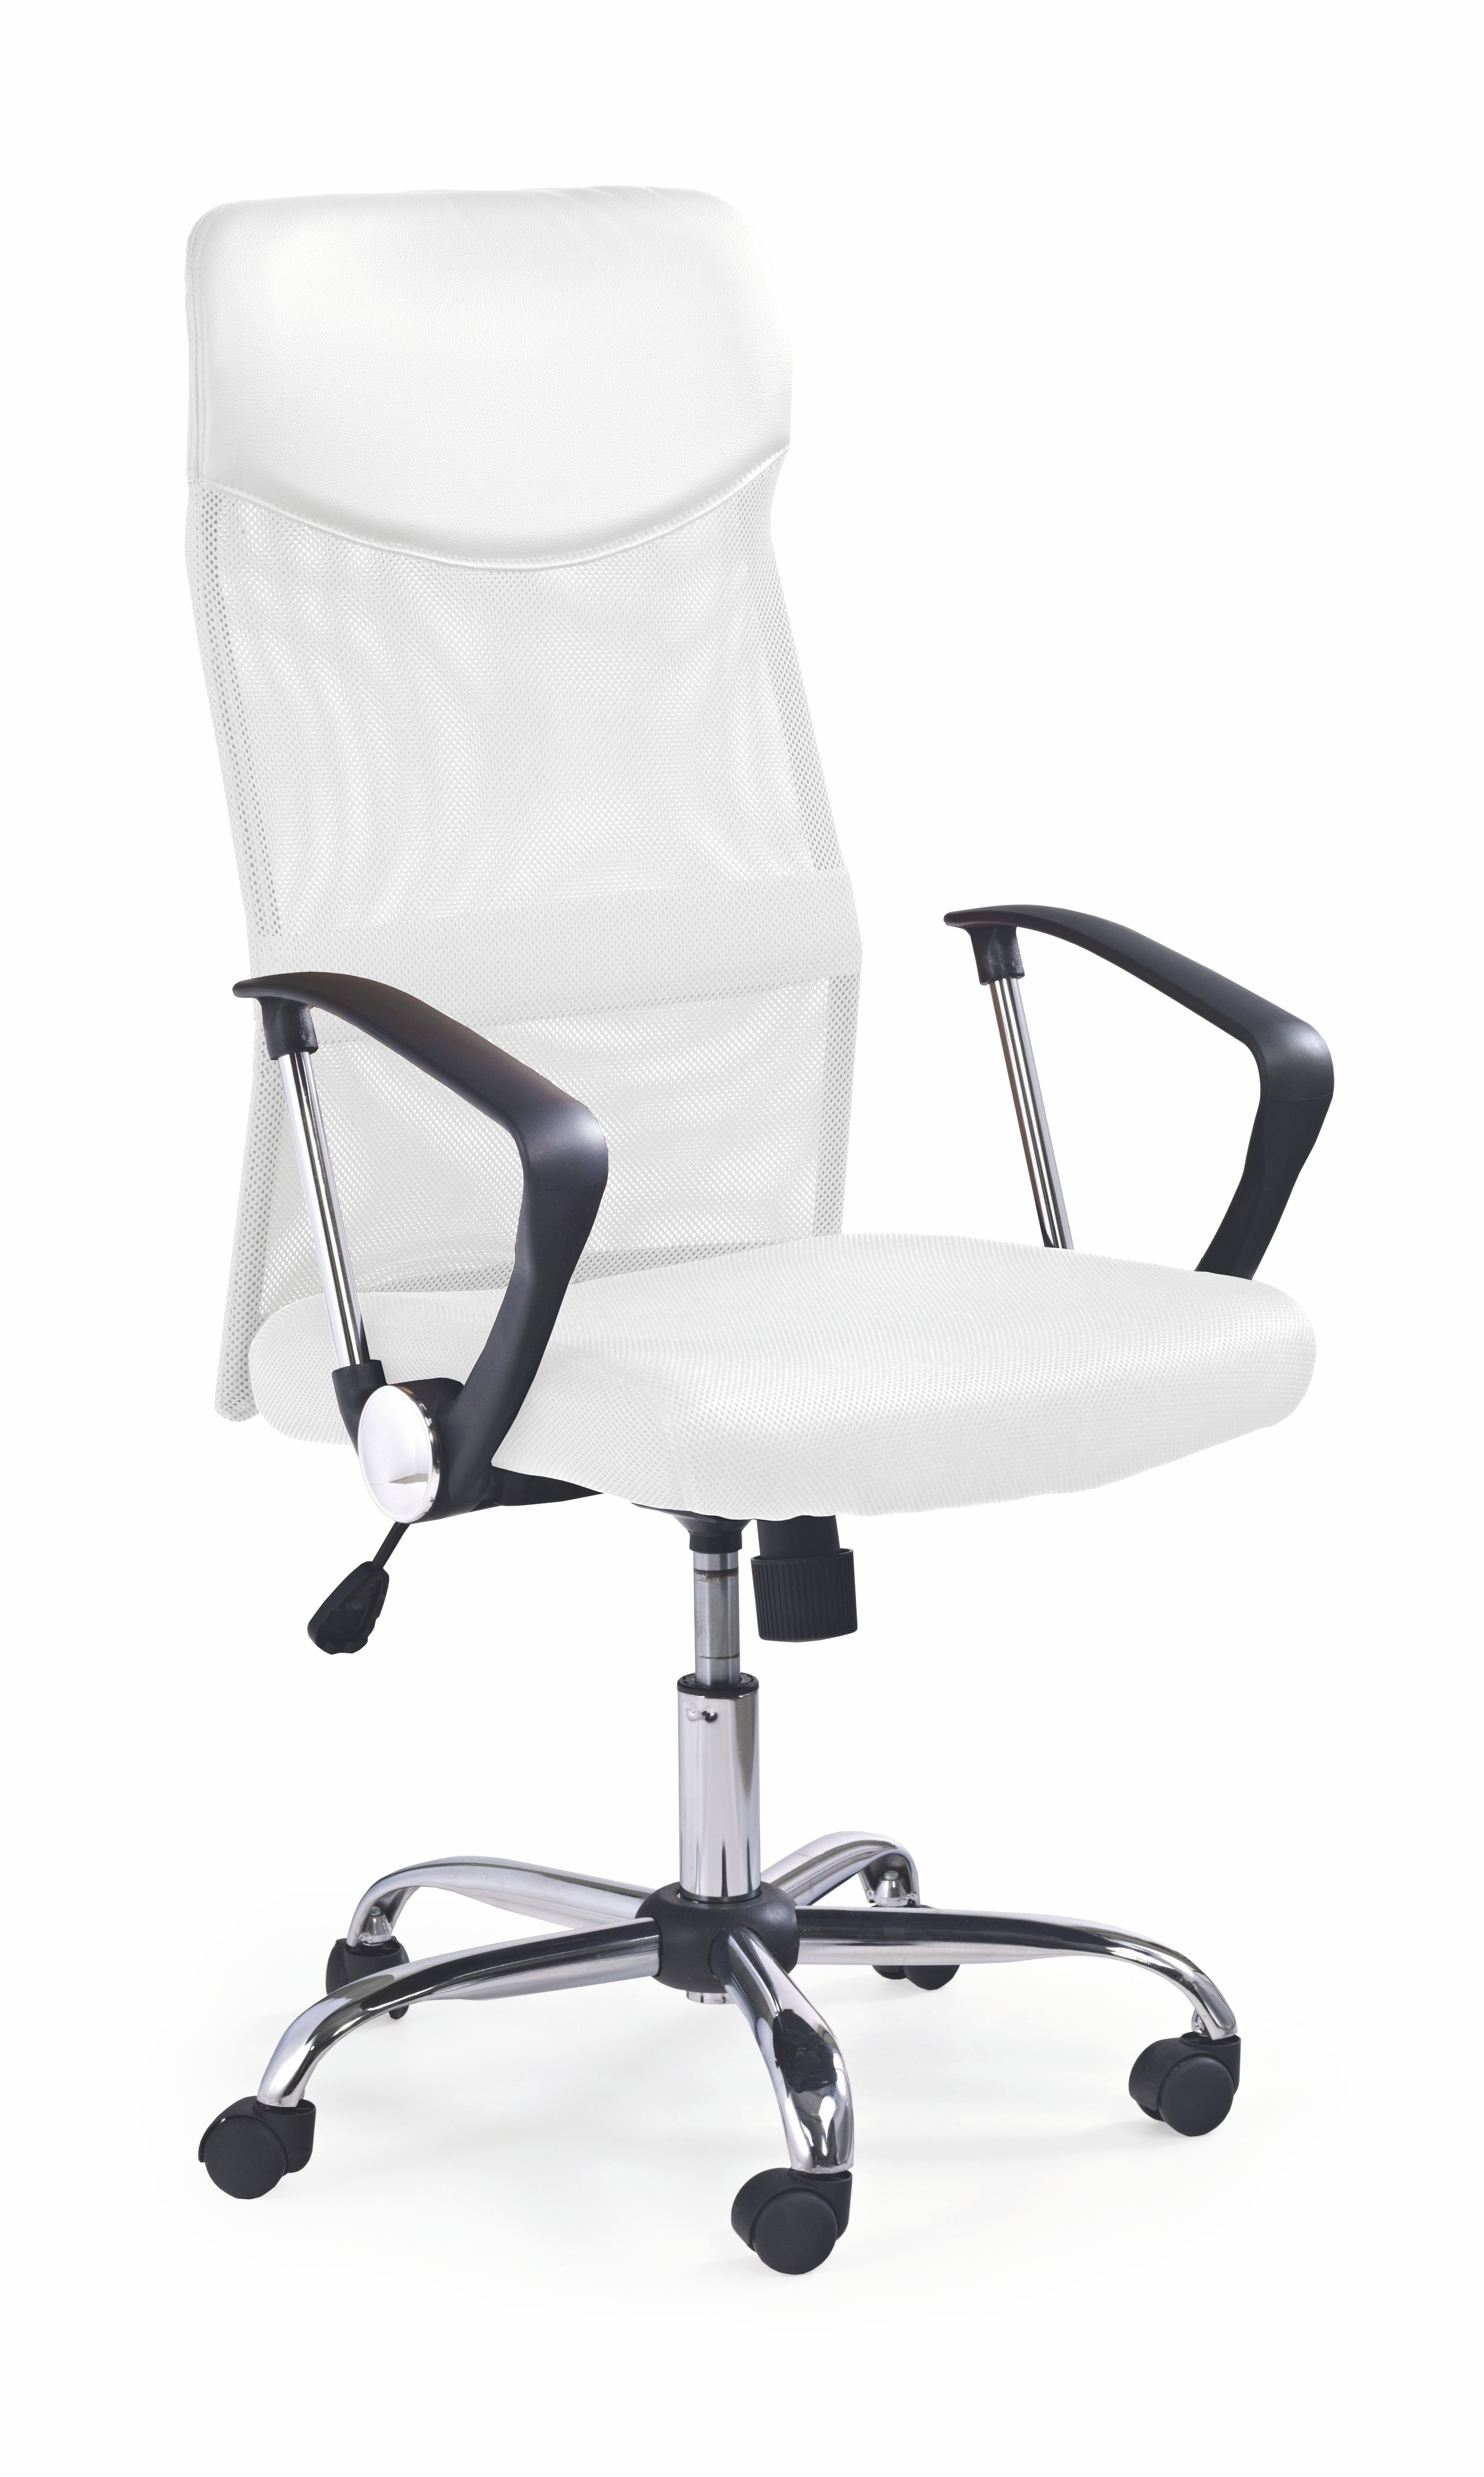 Kancelářská židle - Halmar - Vire (bílá)